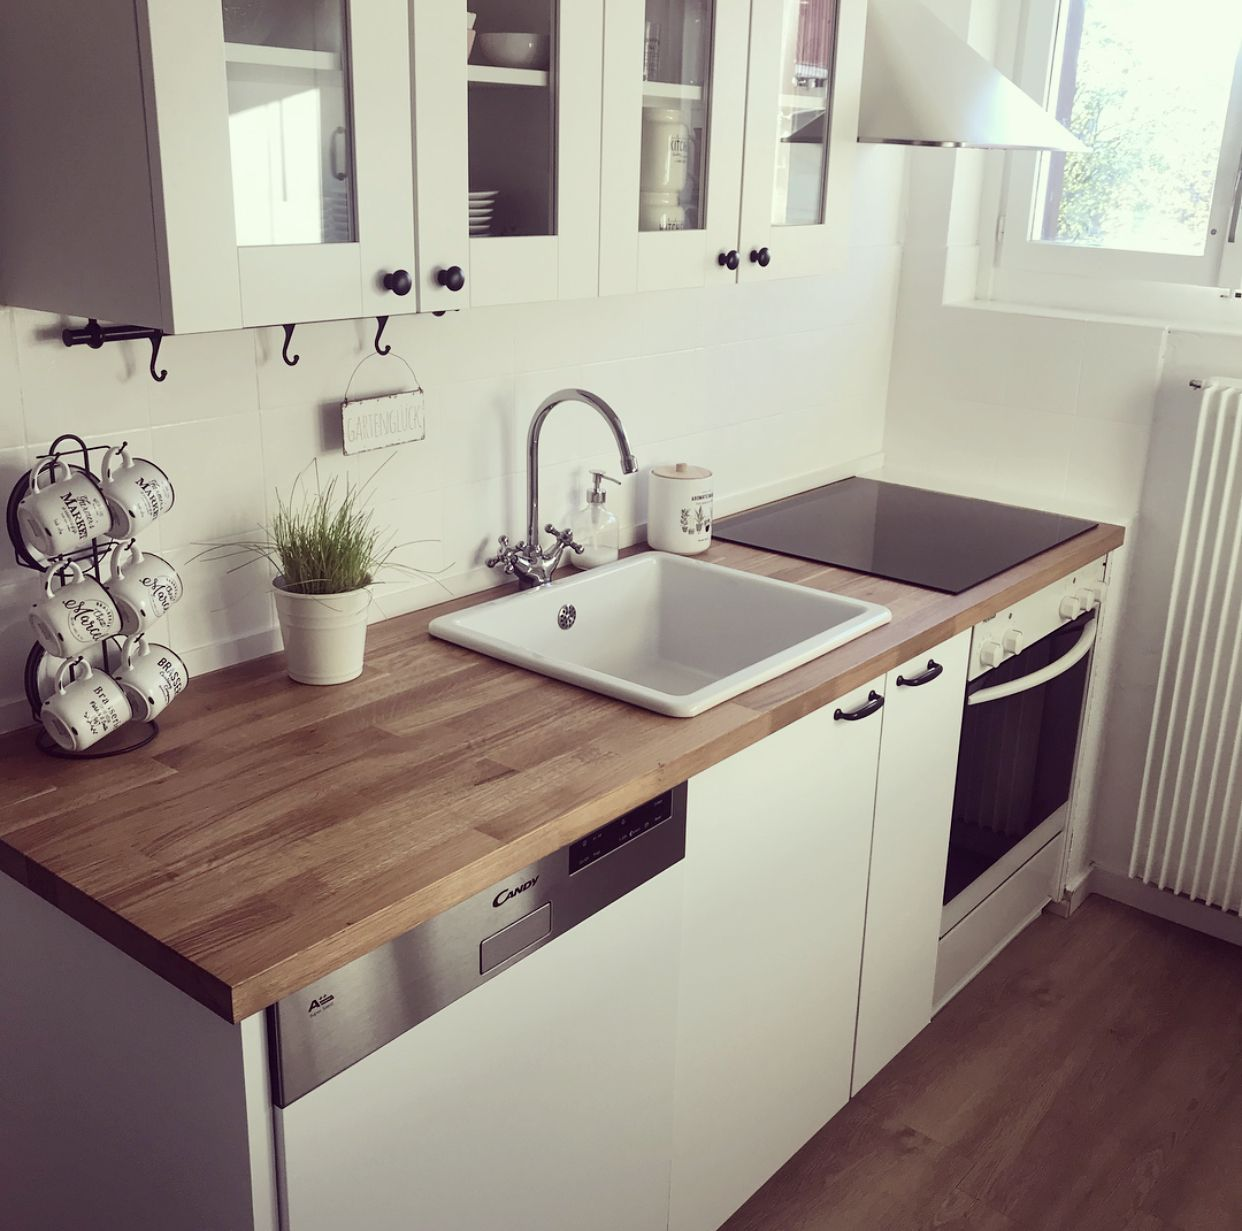 Knoxhult Ikea Kuche Savedal Karlby Wohnung Kuche Ikea Kuche Ikea Kleine Kuche